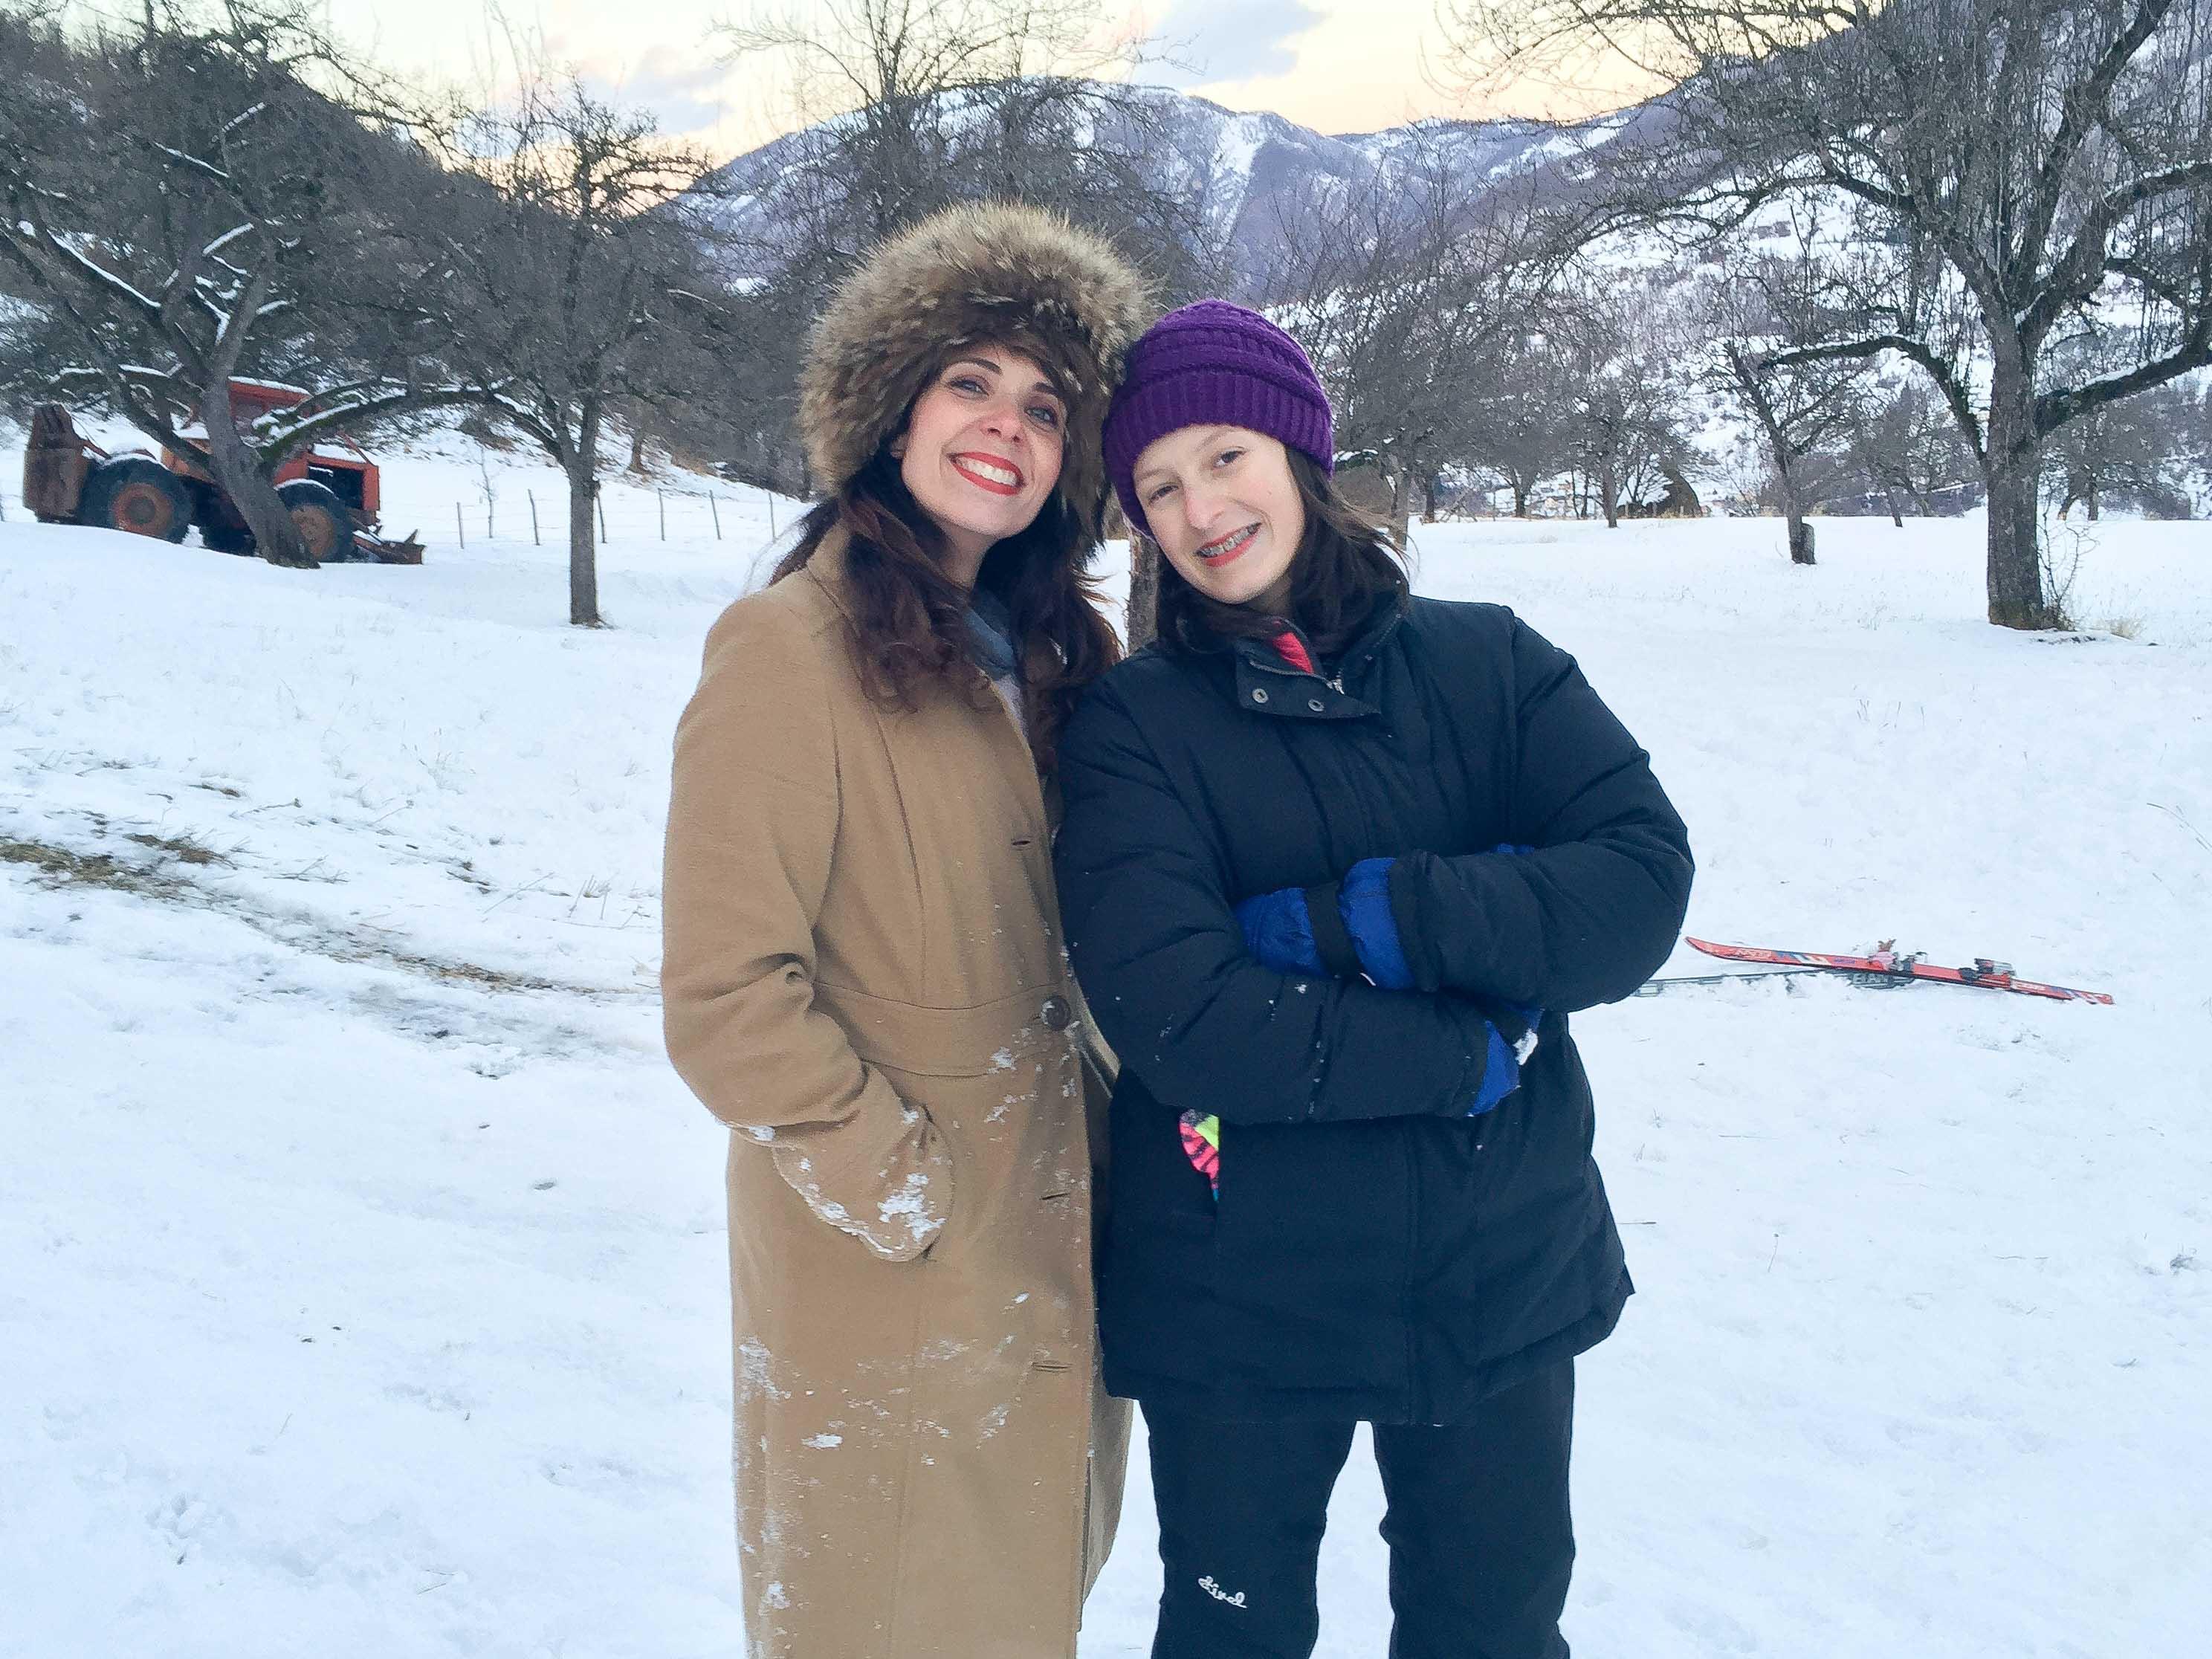 Ladies posing in the snow mountains of Montenegro